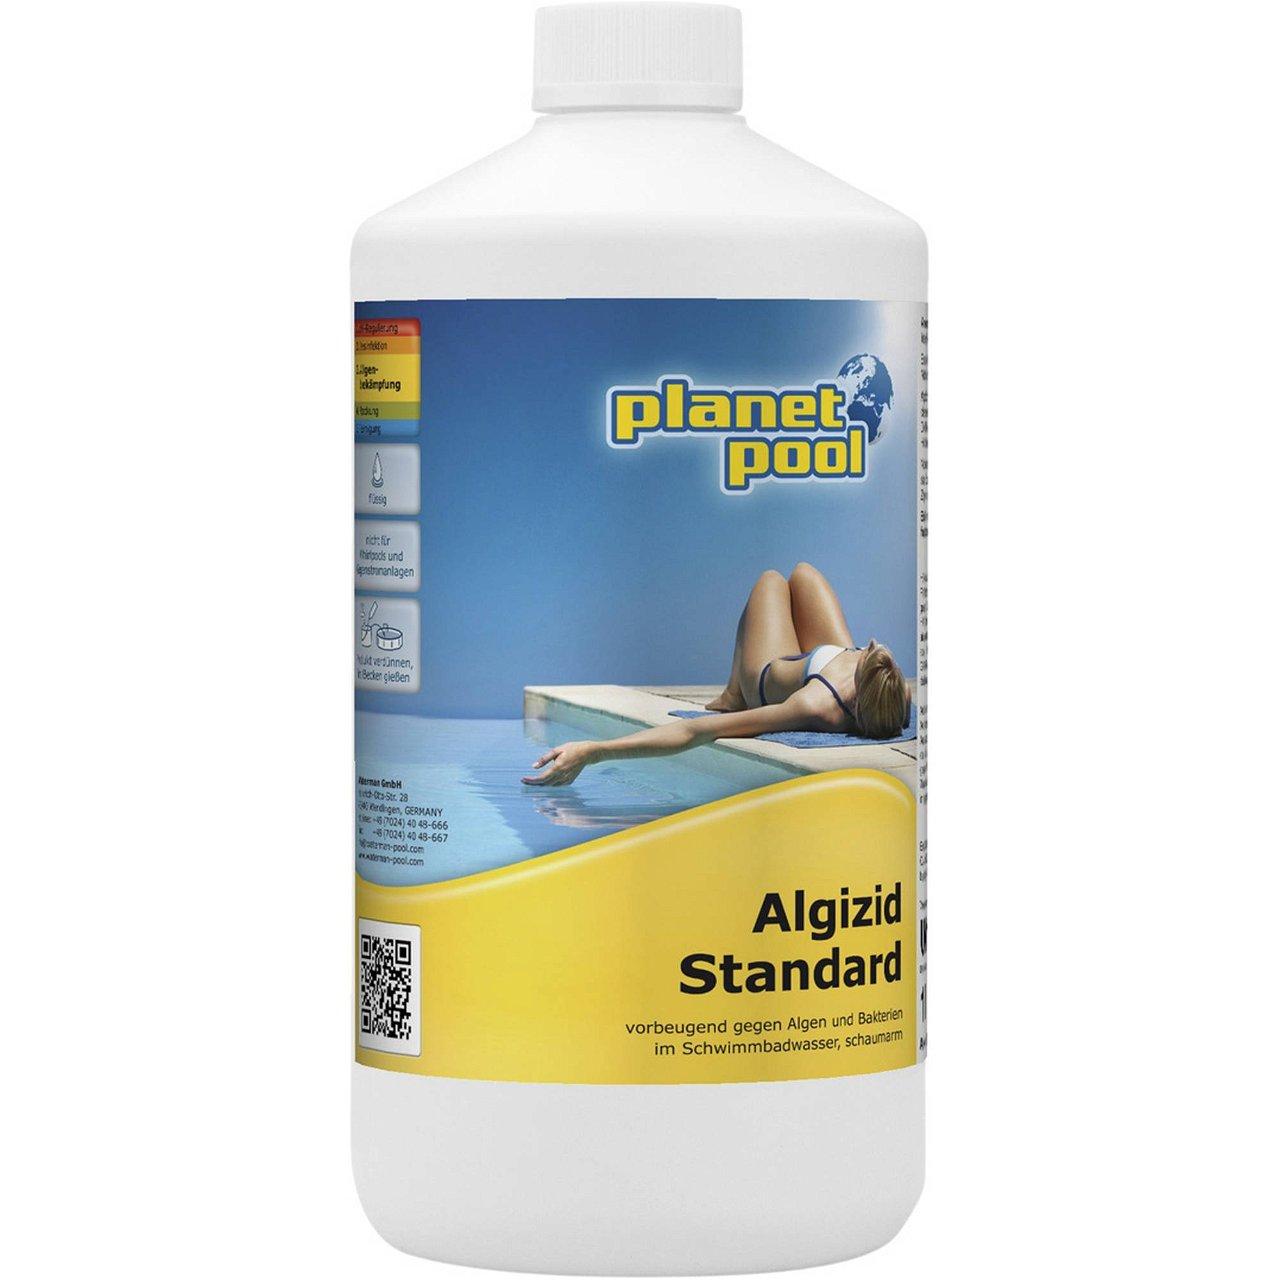 PLANET POOL Algizid Standard 1 Liter